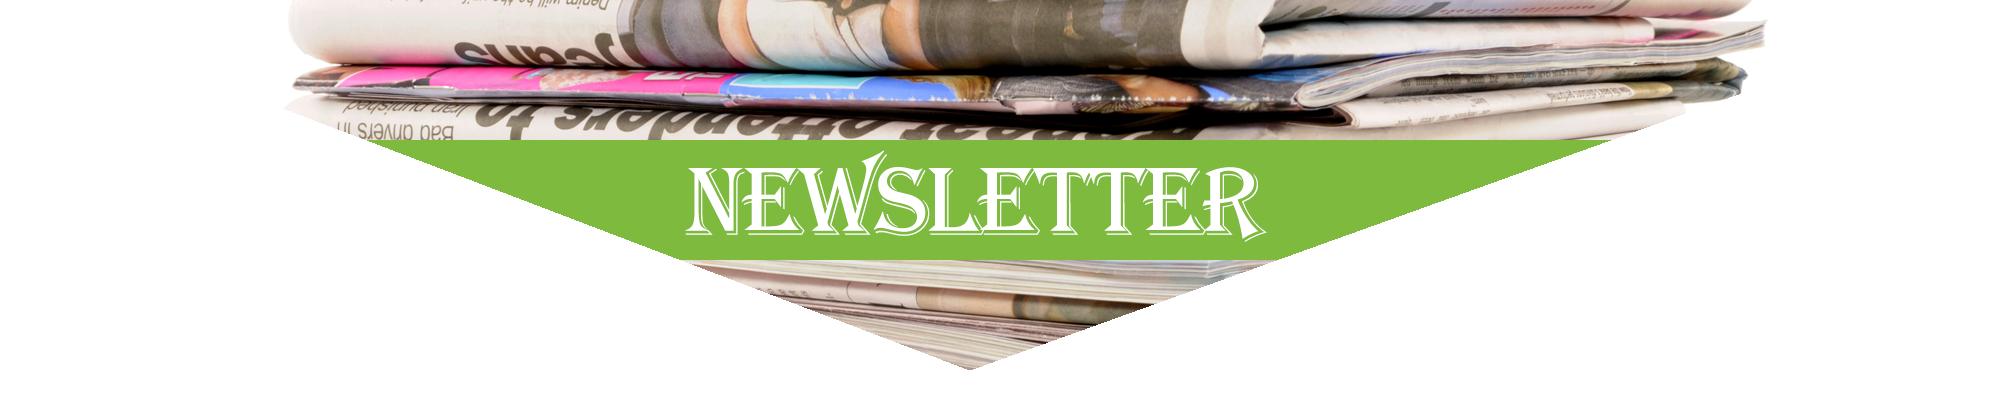 Newsletter_Zeillinger